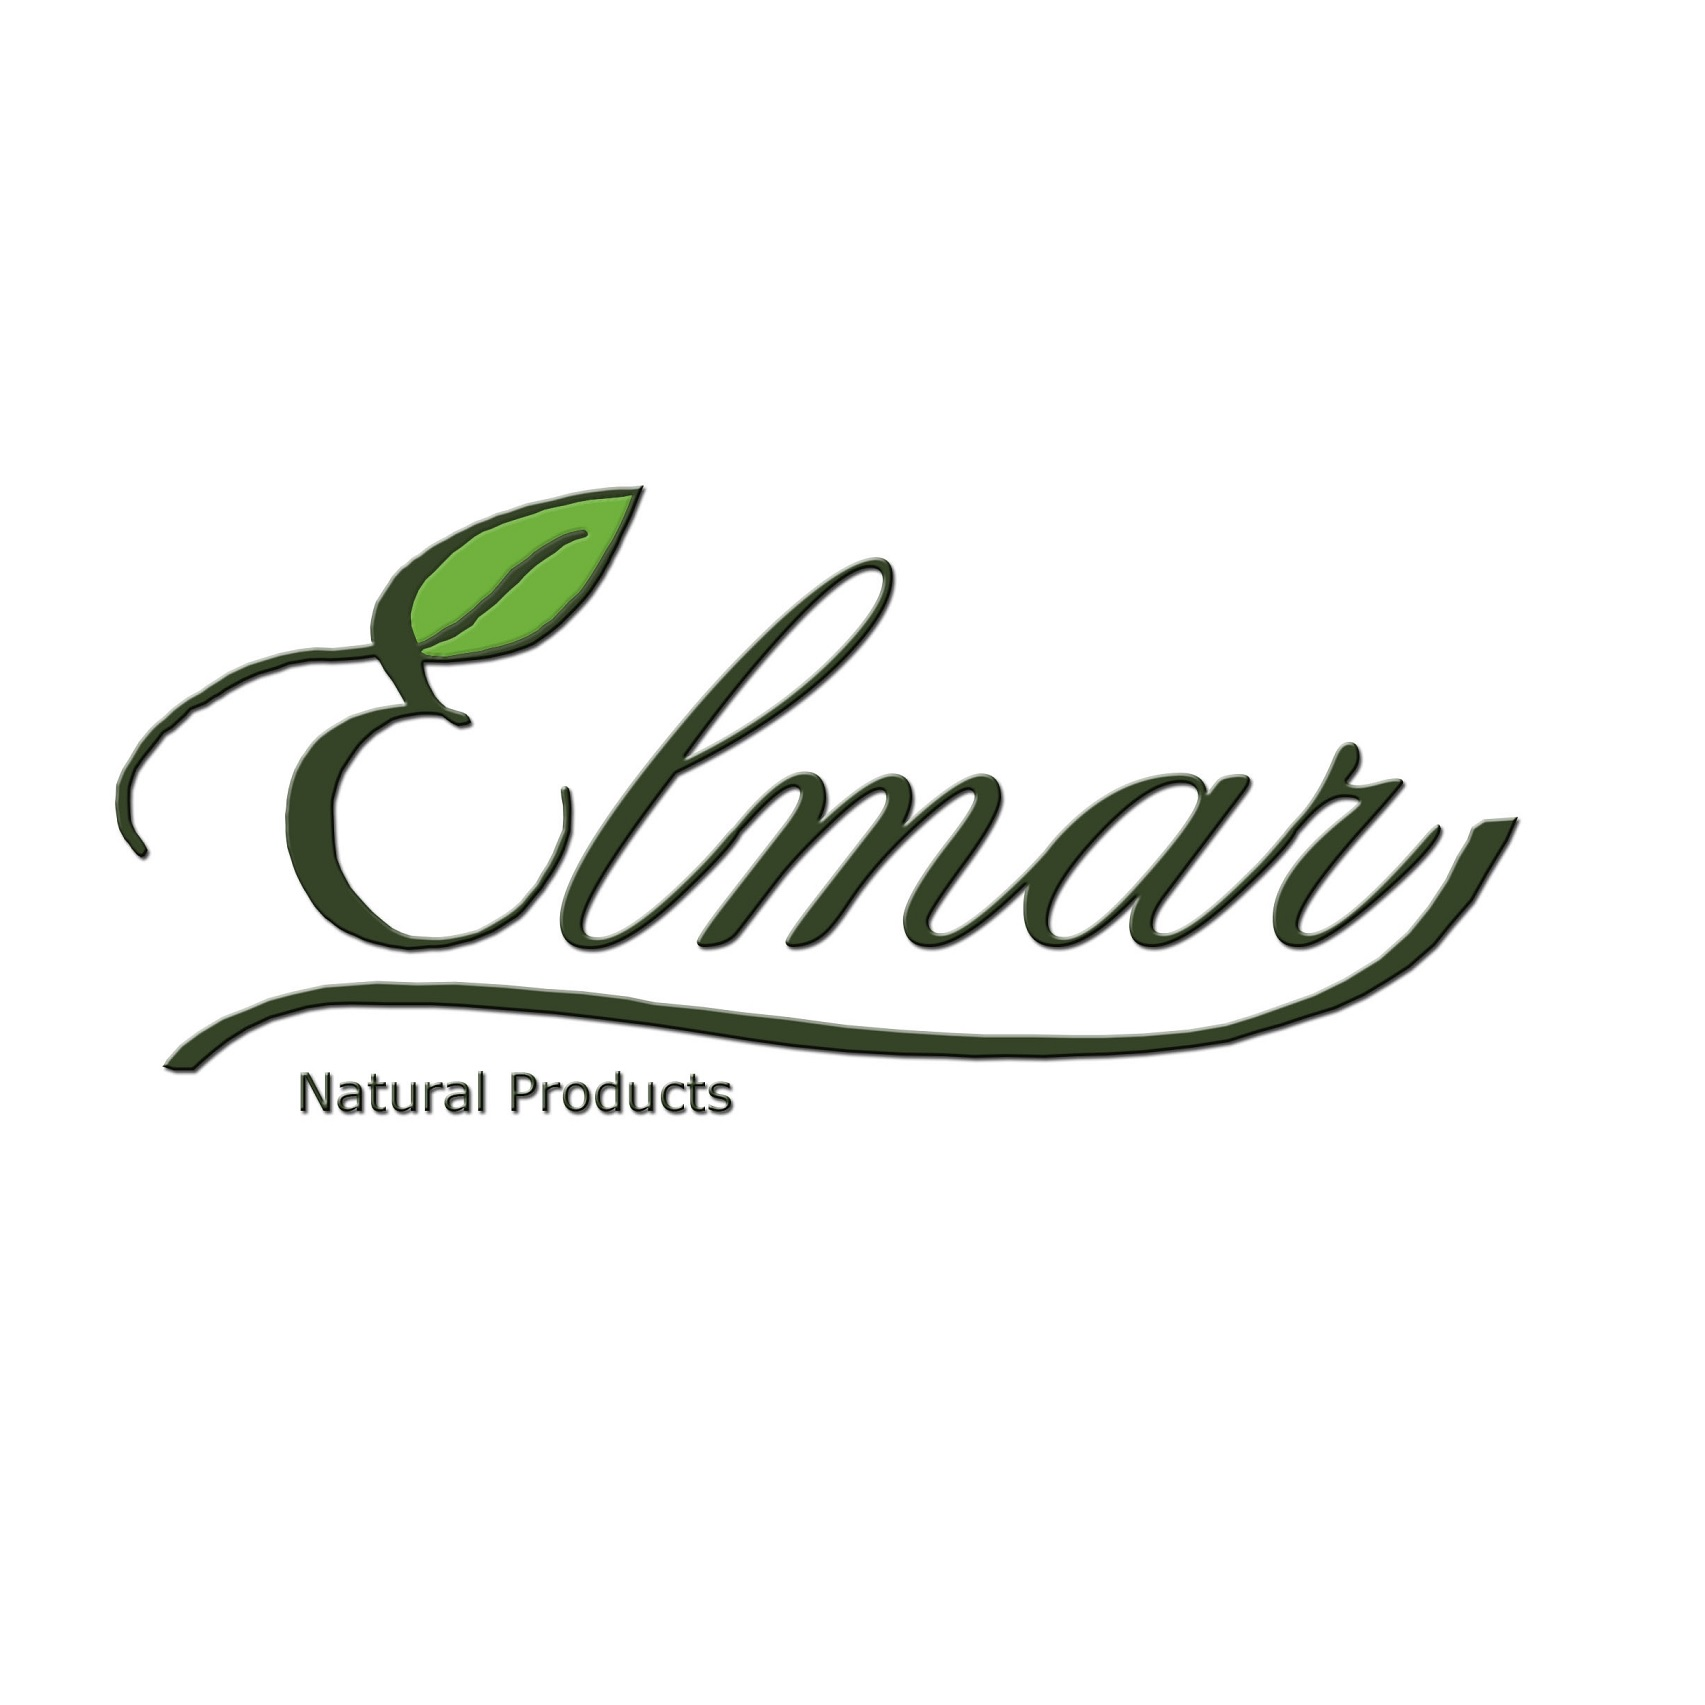 Elmar Trading & Production Co Ltd logo